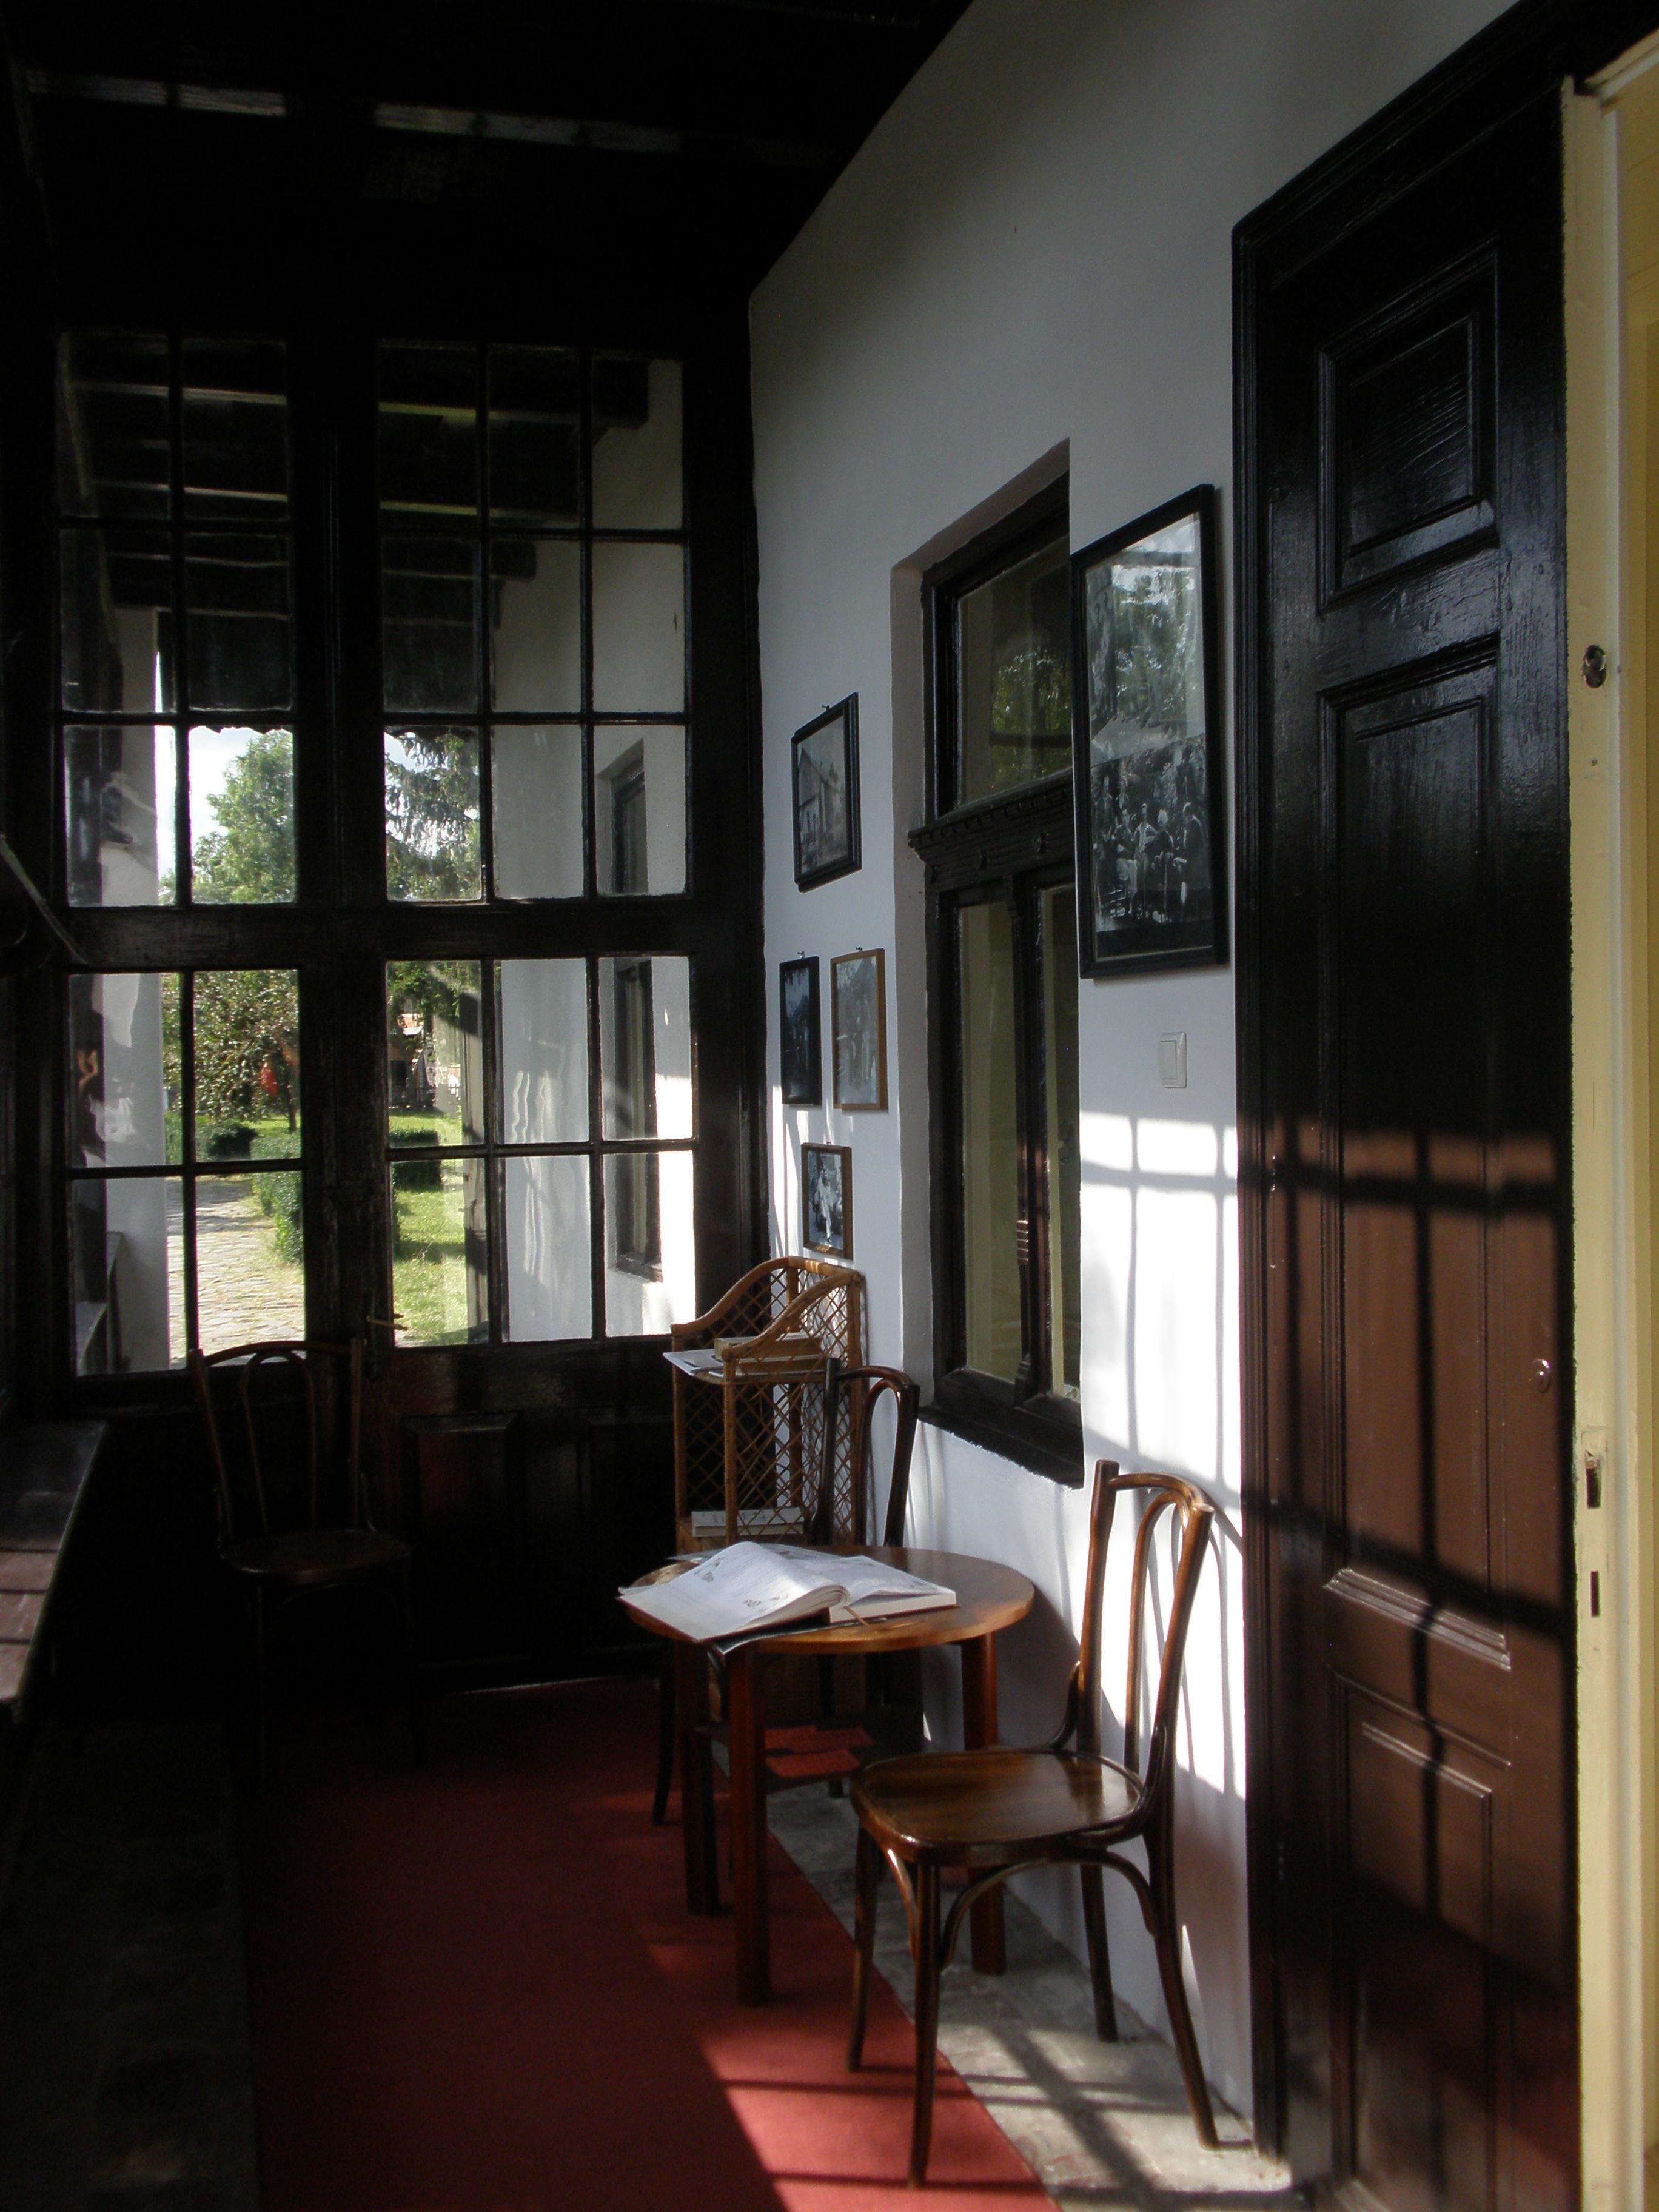 A veranda